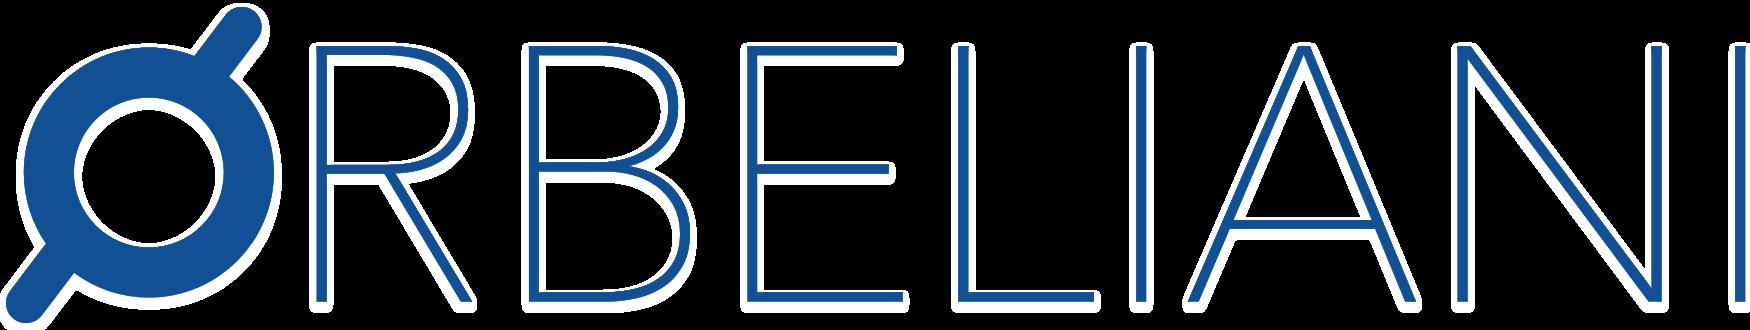 Orb_LogoFull_Blue1750px.png